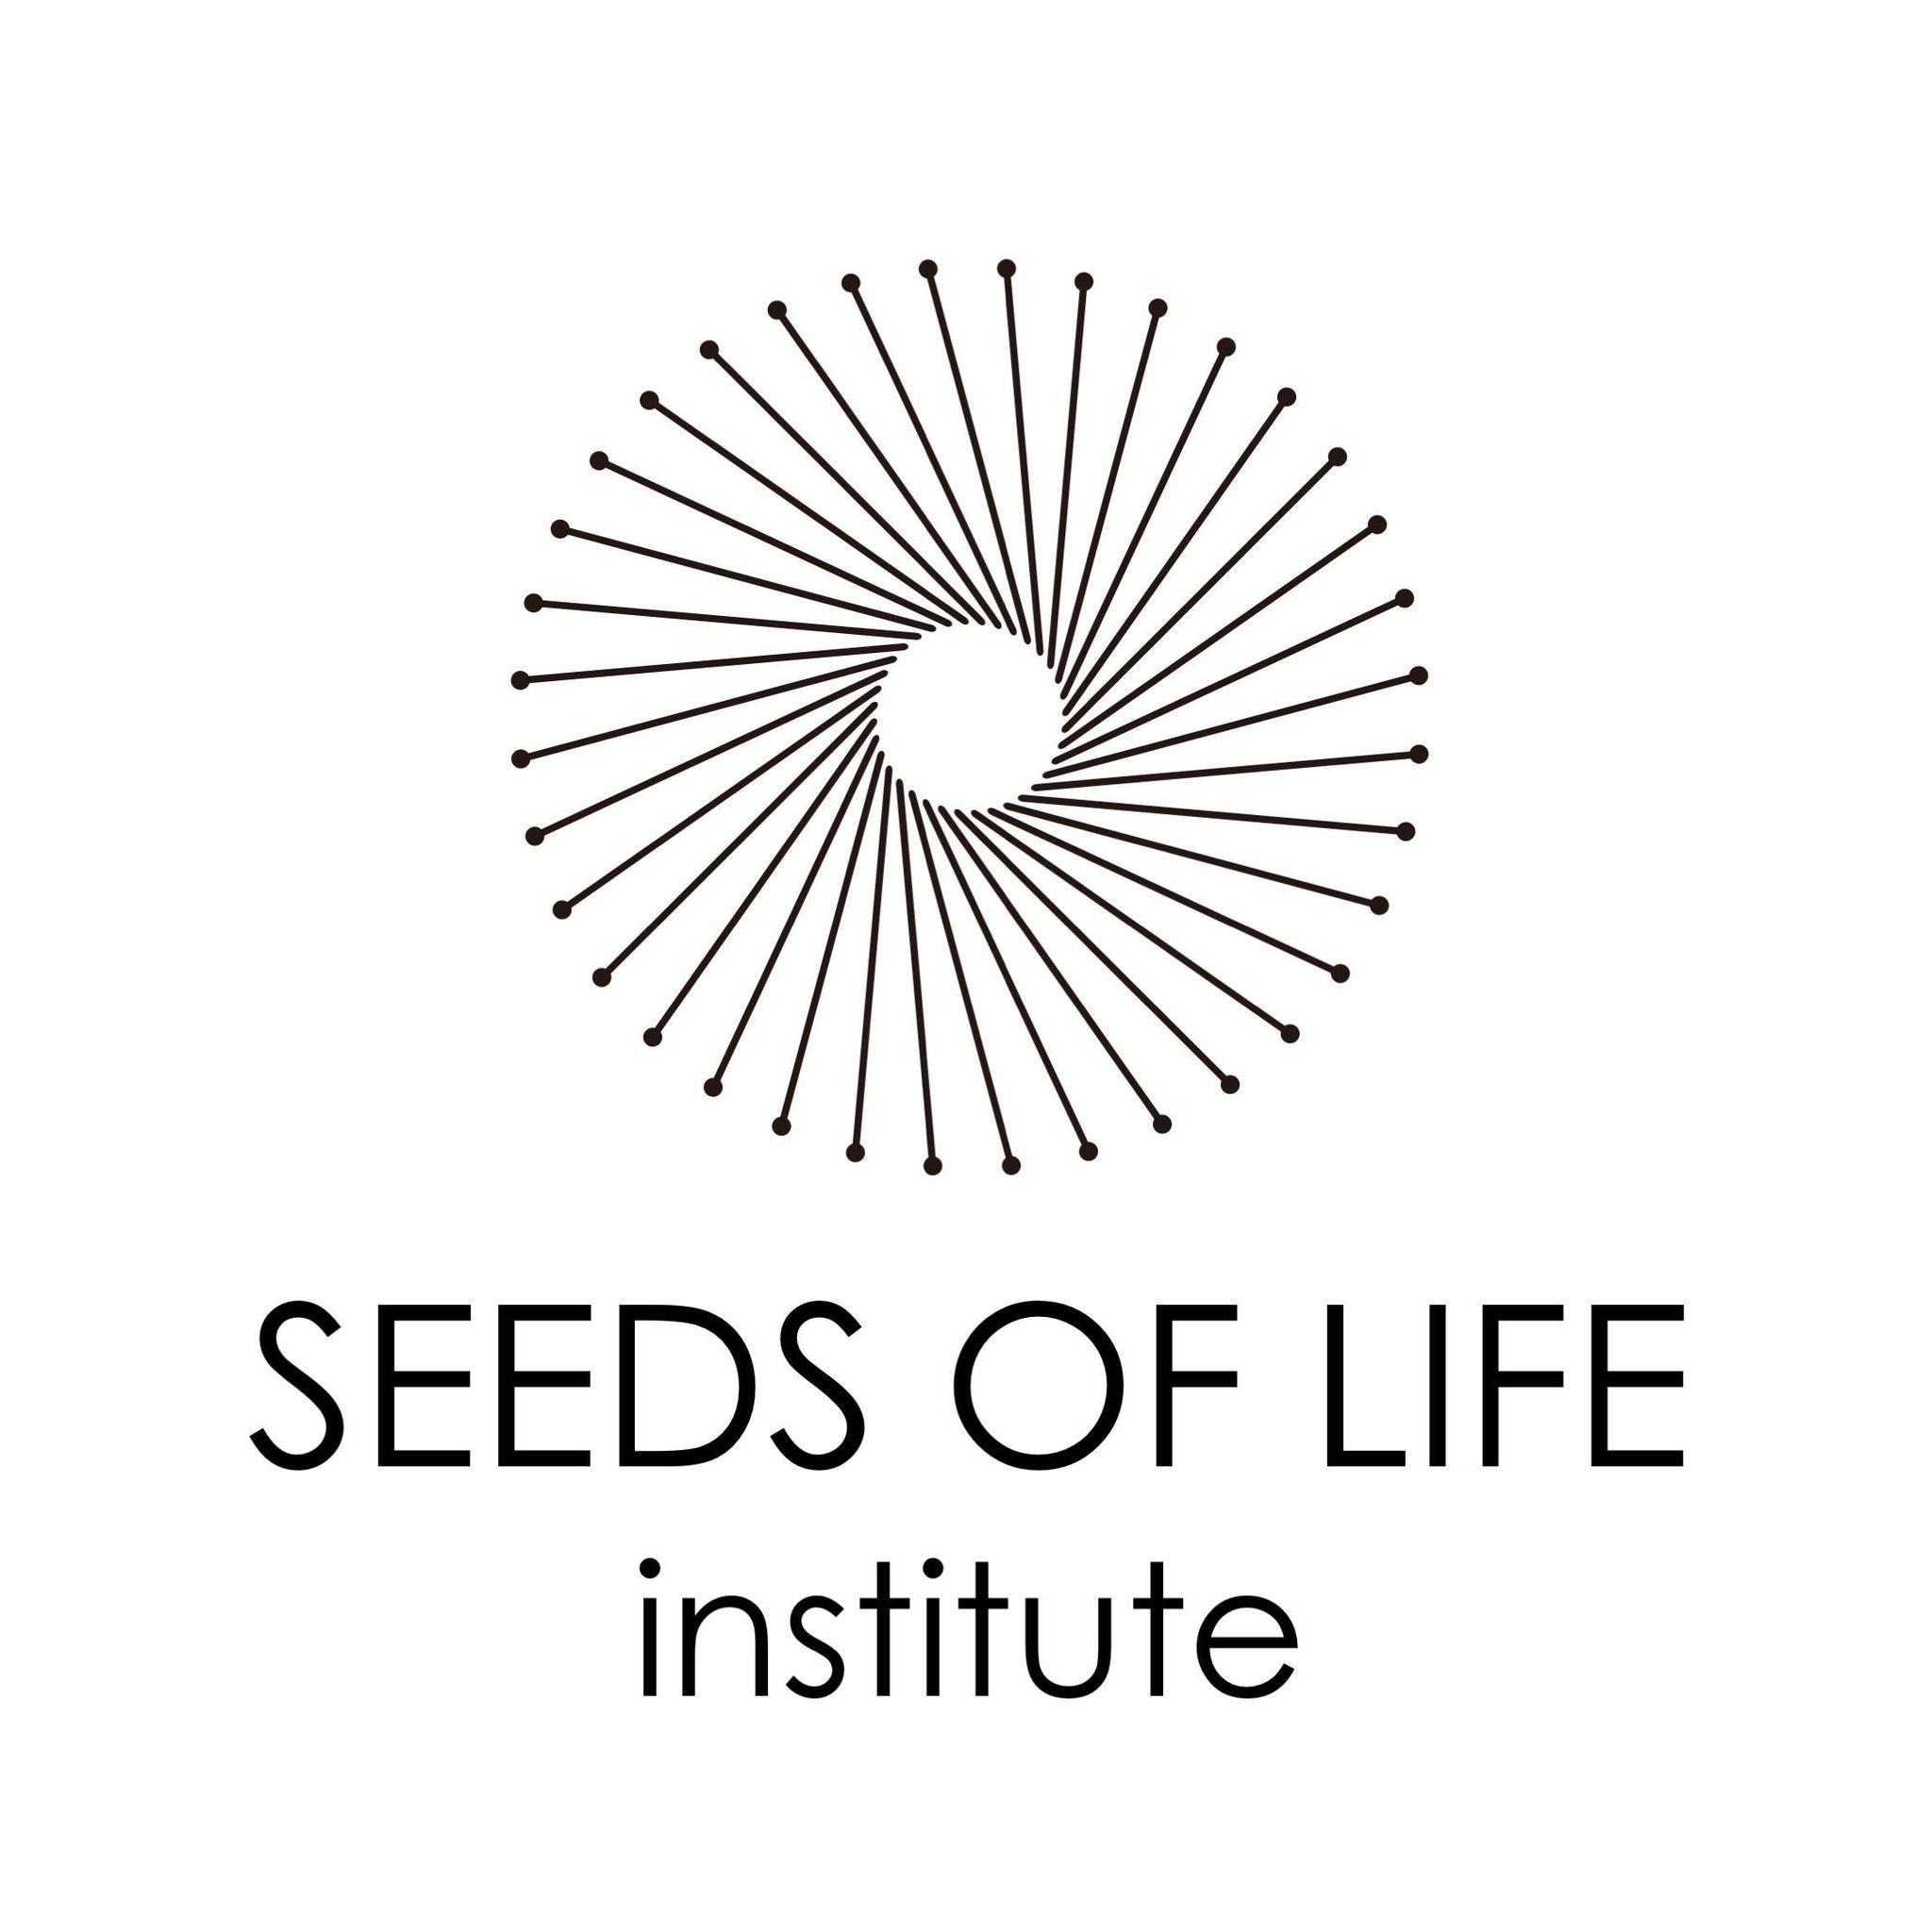 SEEDS OF LIFE institute